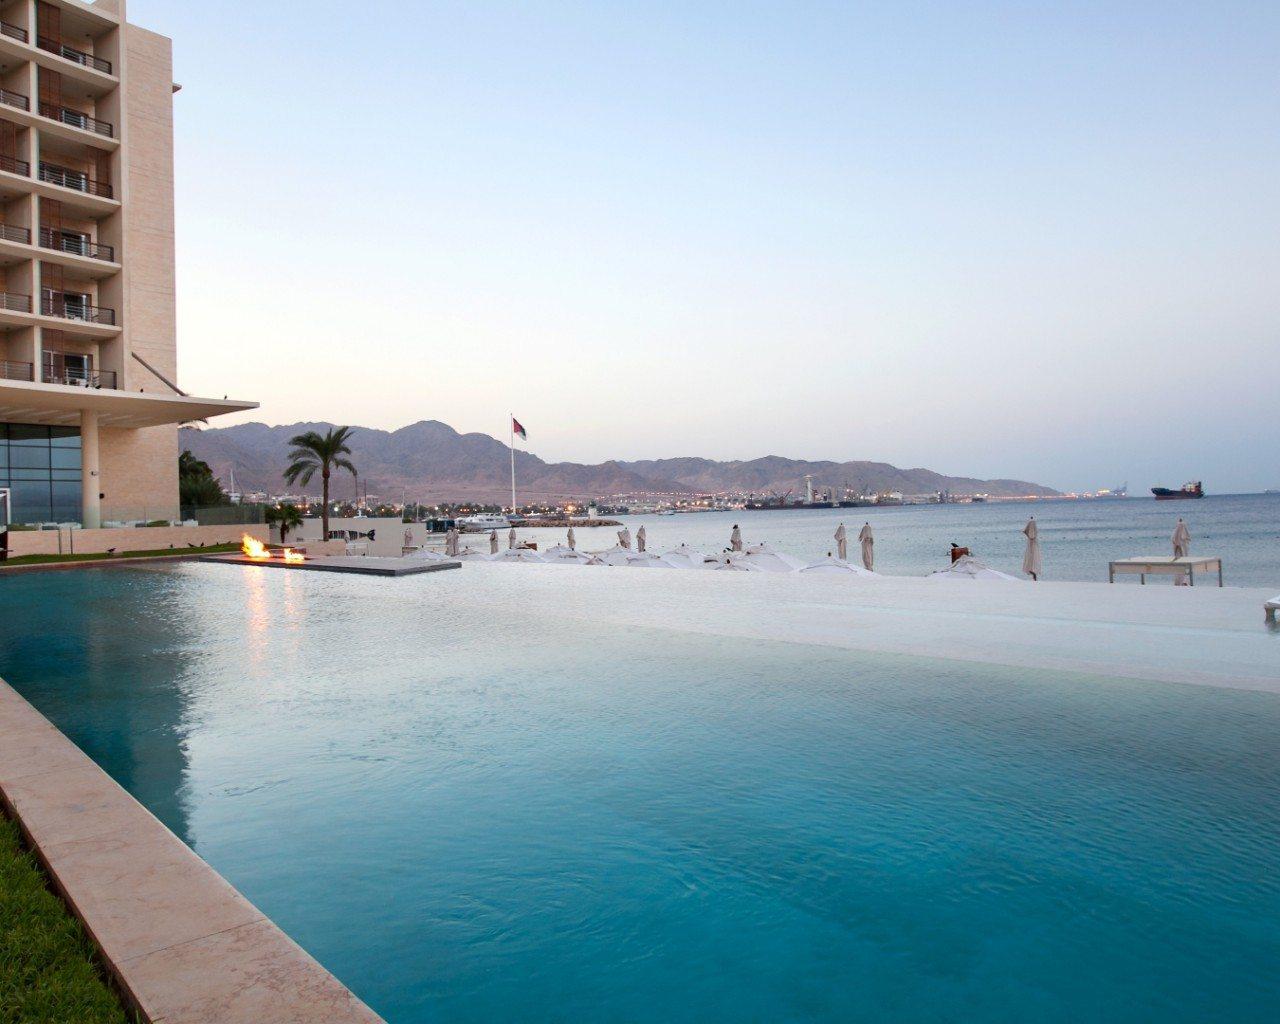 Aqaba Jordan  city images : Kempinski Hotel Aqaba, Jordan | Infinity Pools